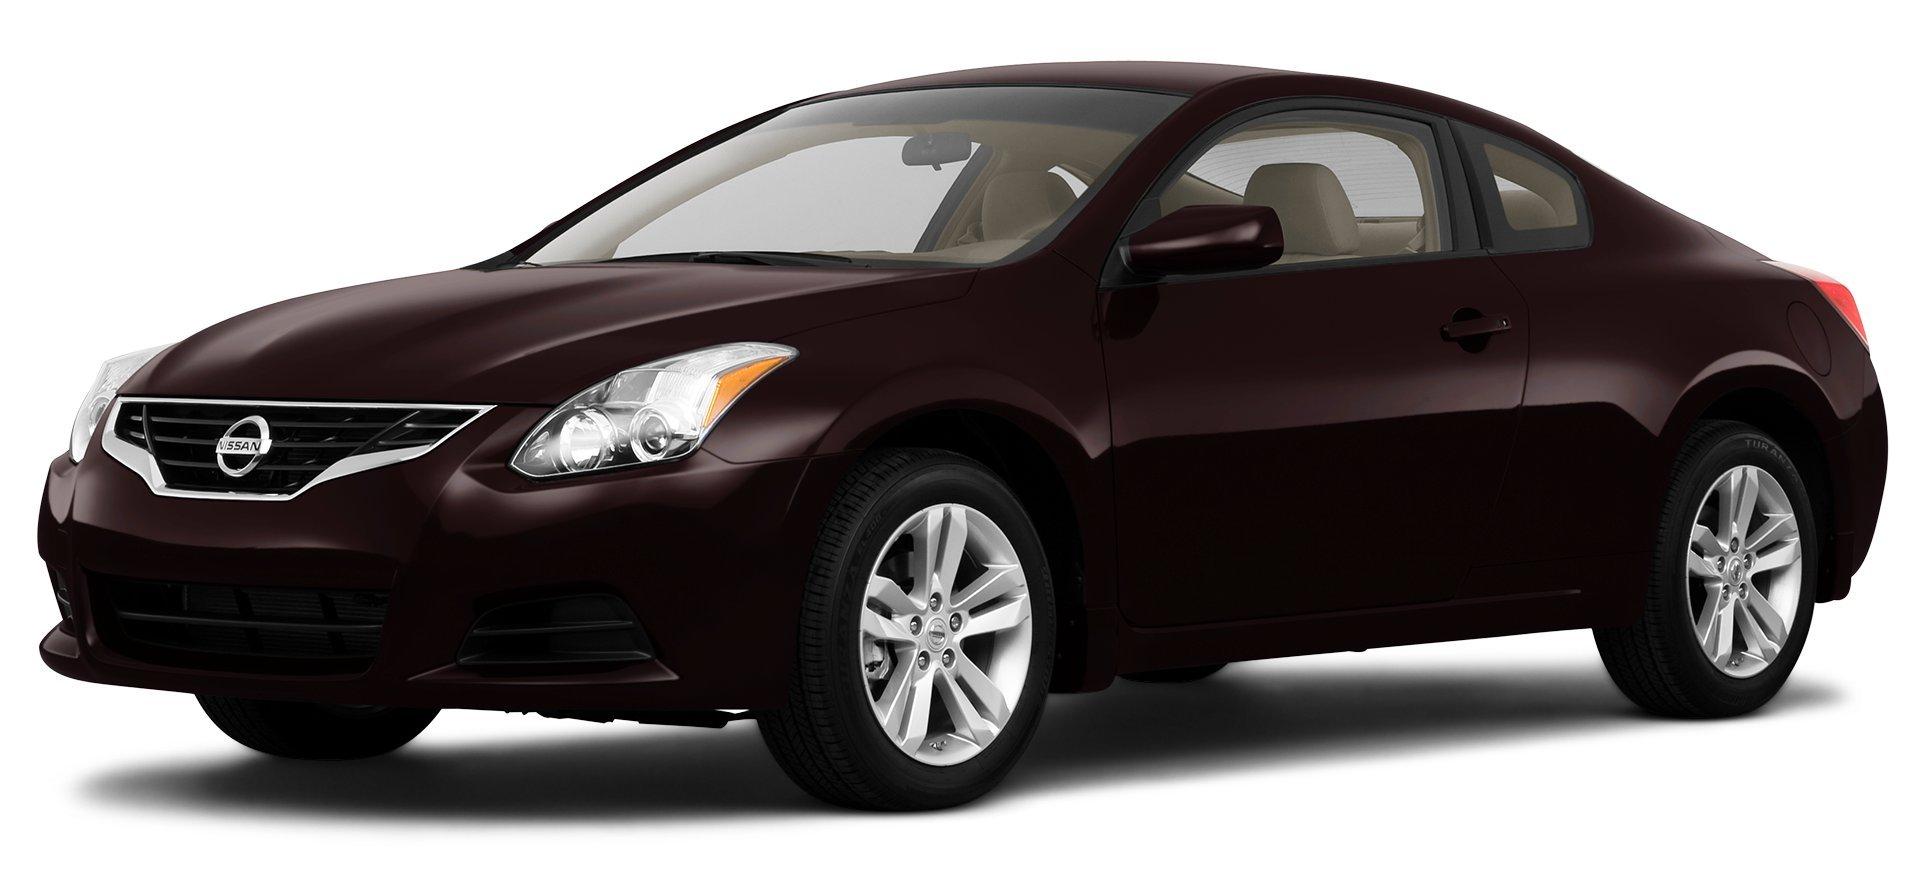 ... 2010 Nissan Altima 2.5 S, 2-Door Coupe 4-Cylinder CVT